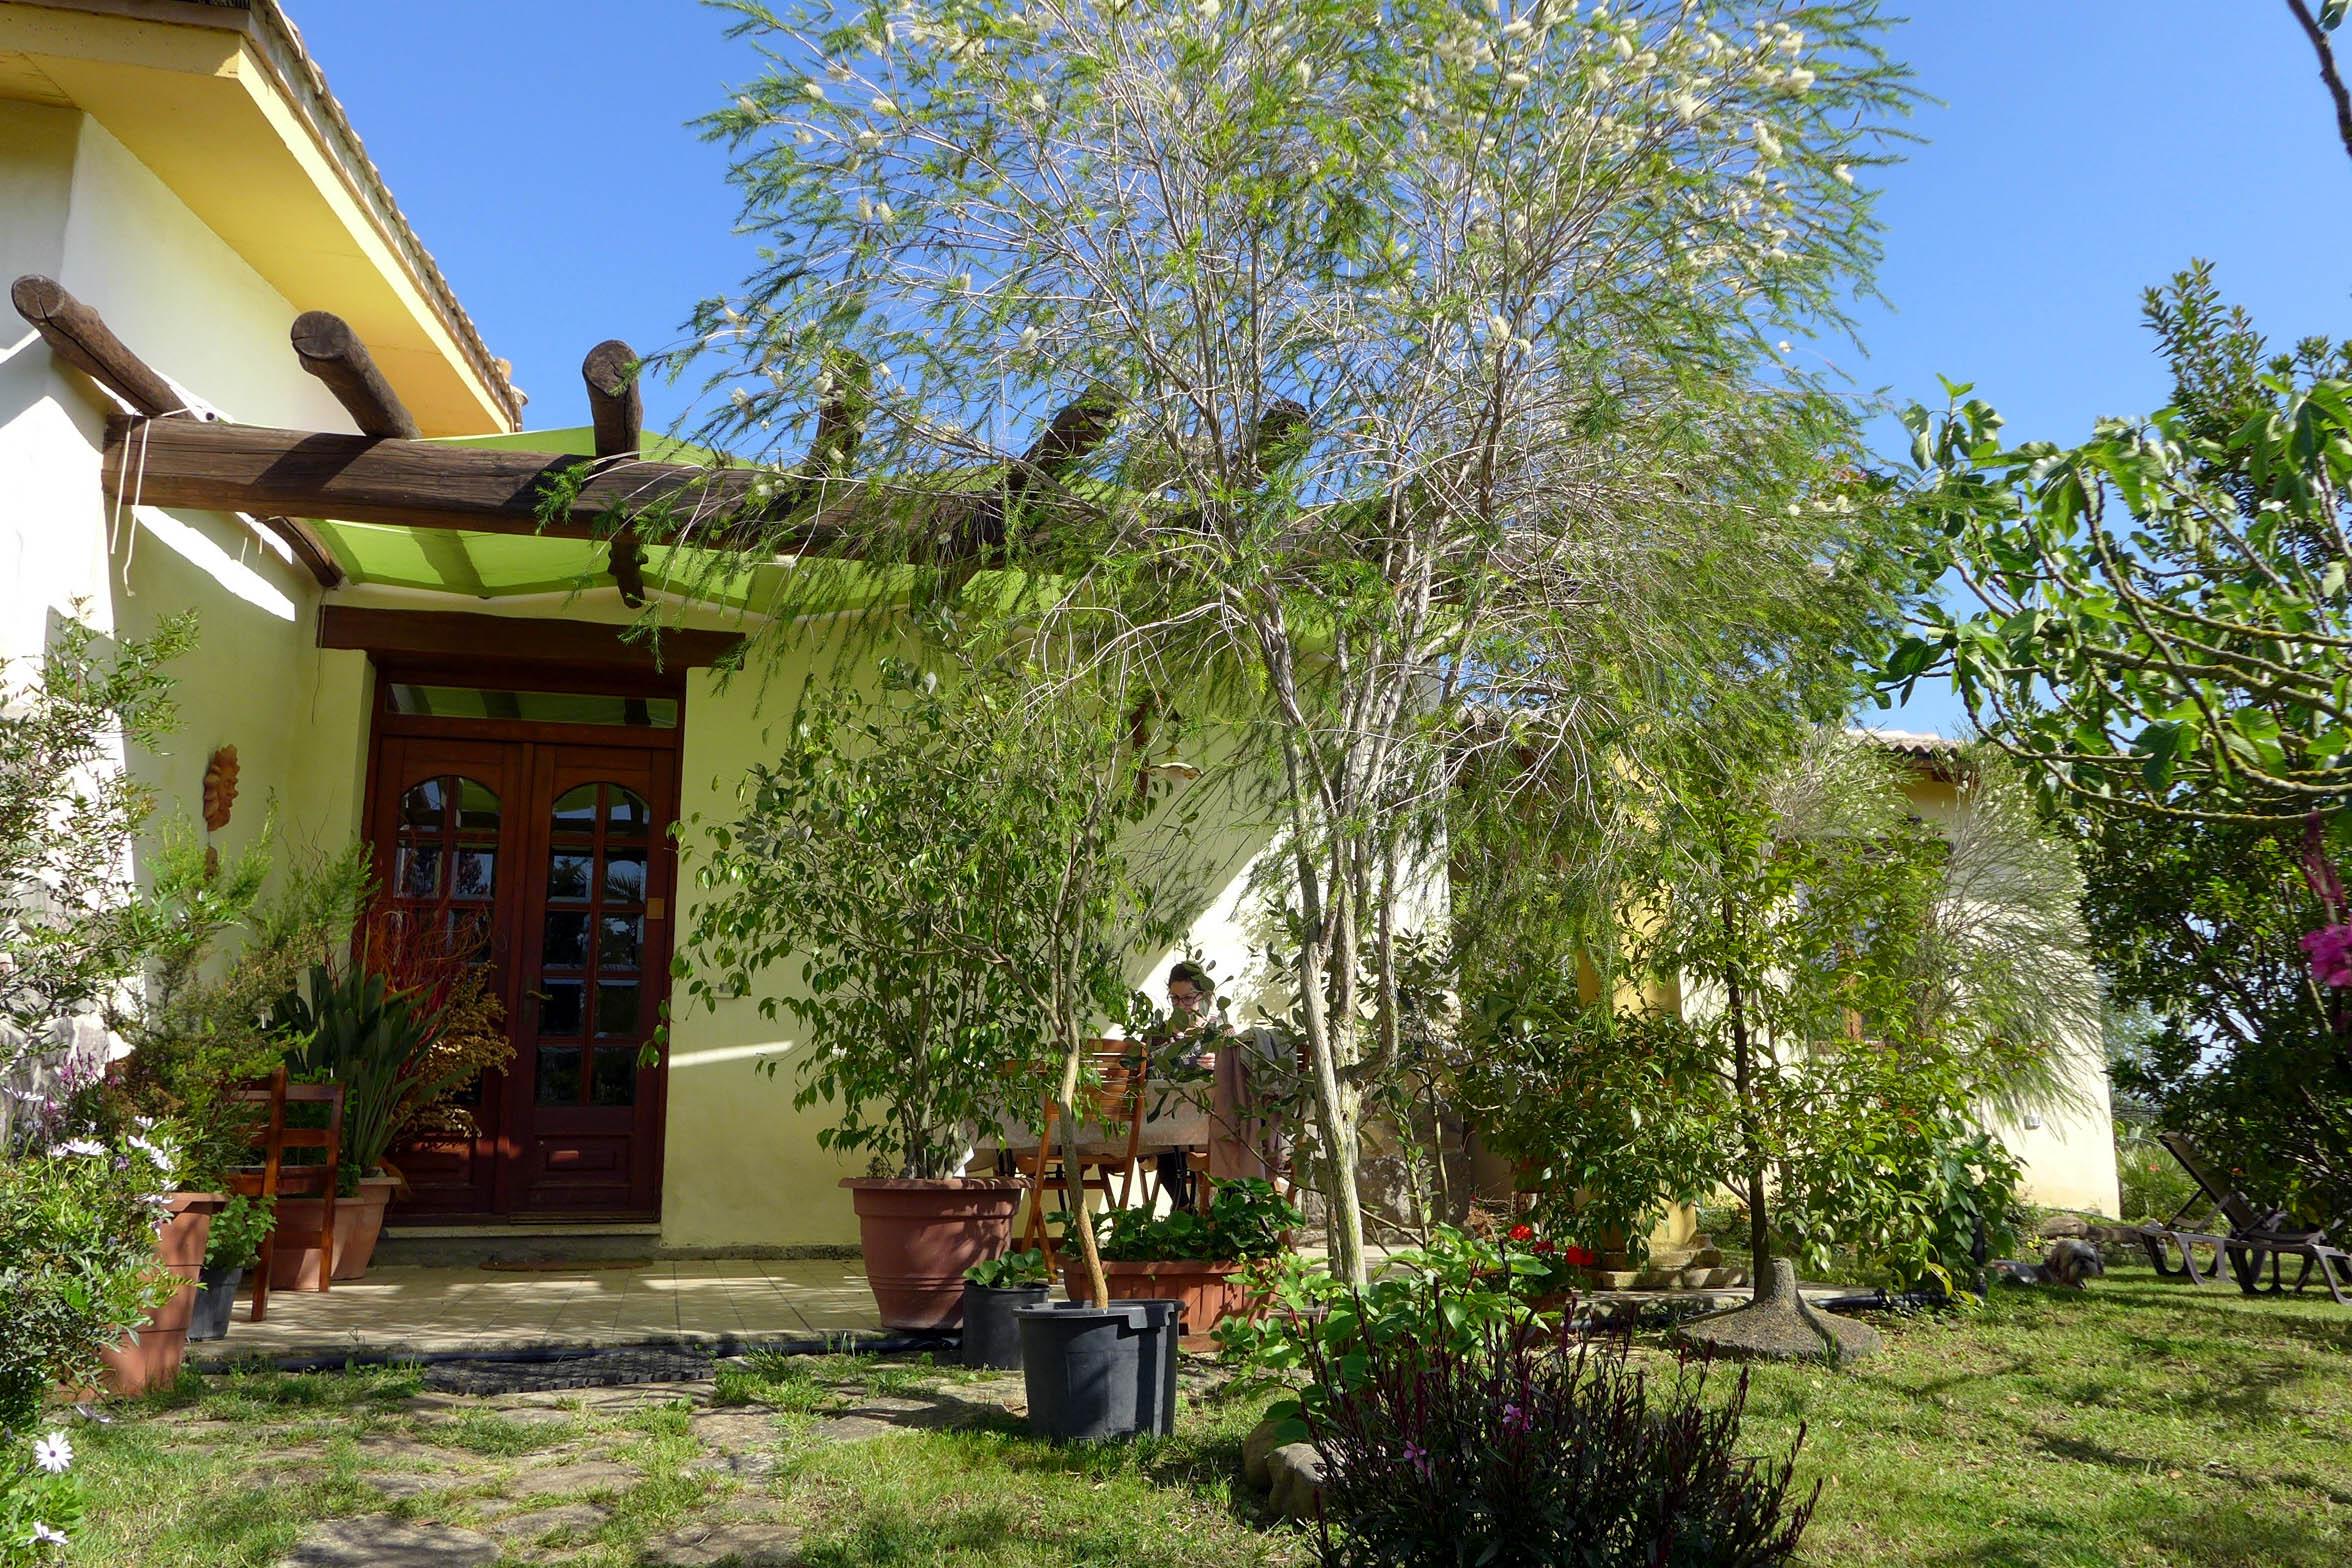 veranda_9_hds